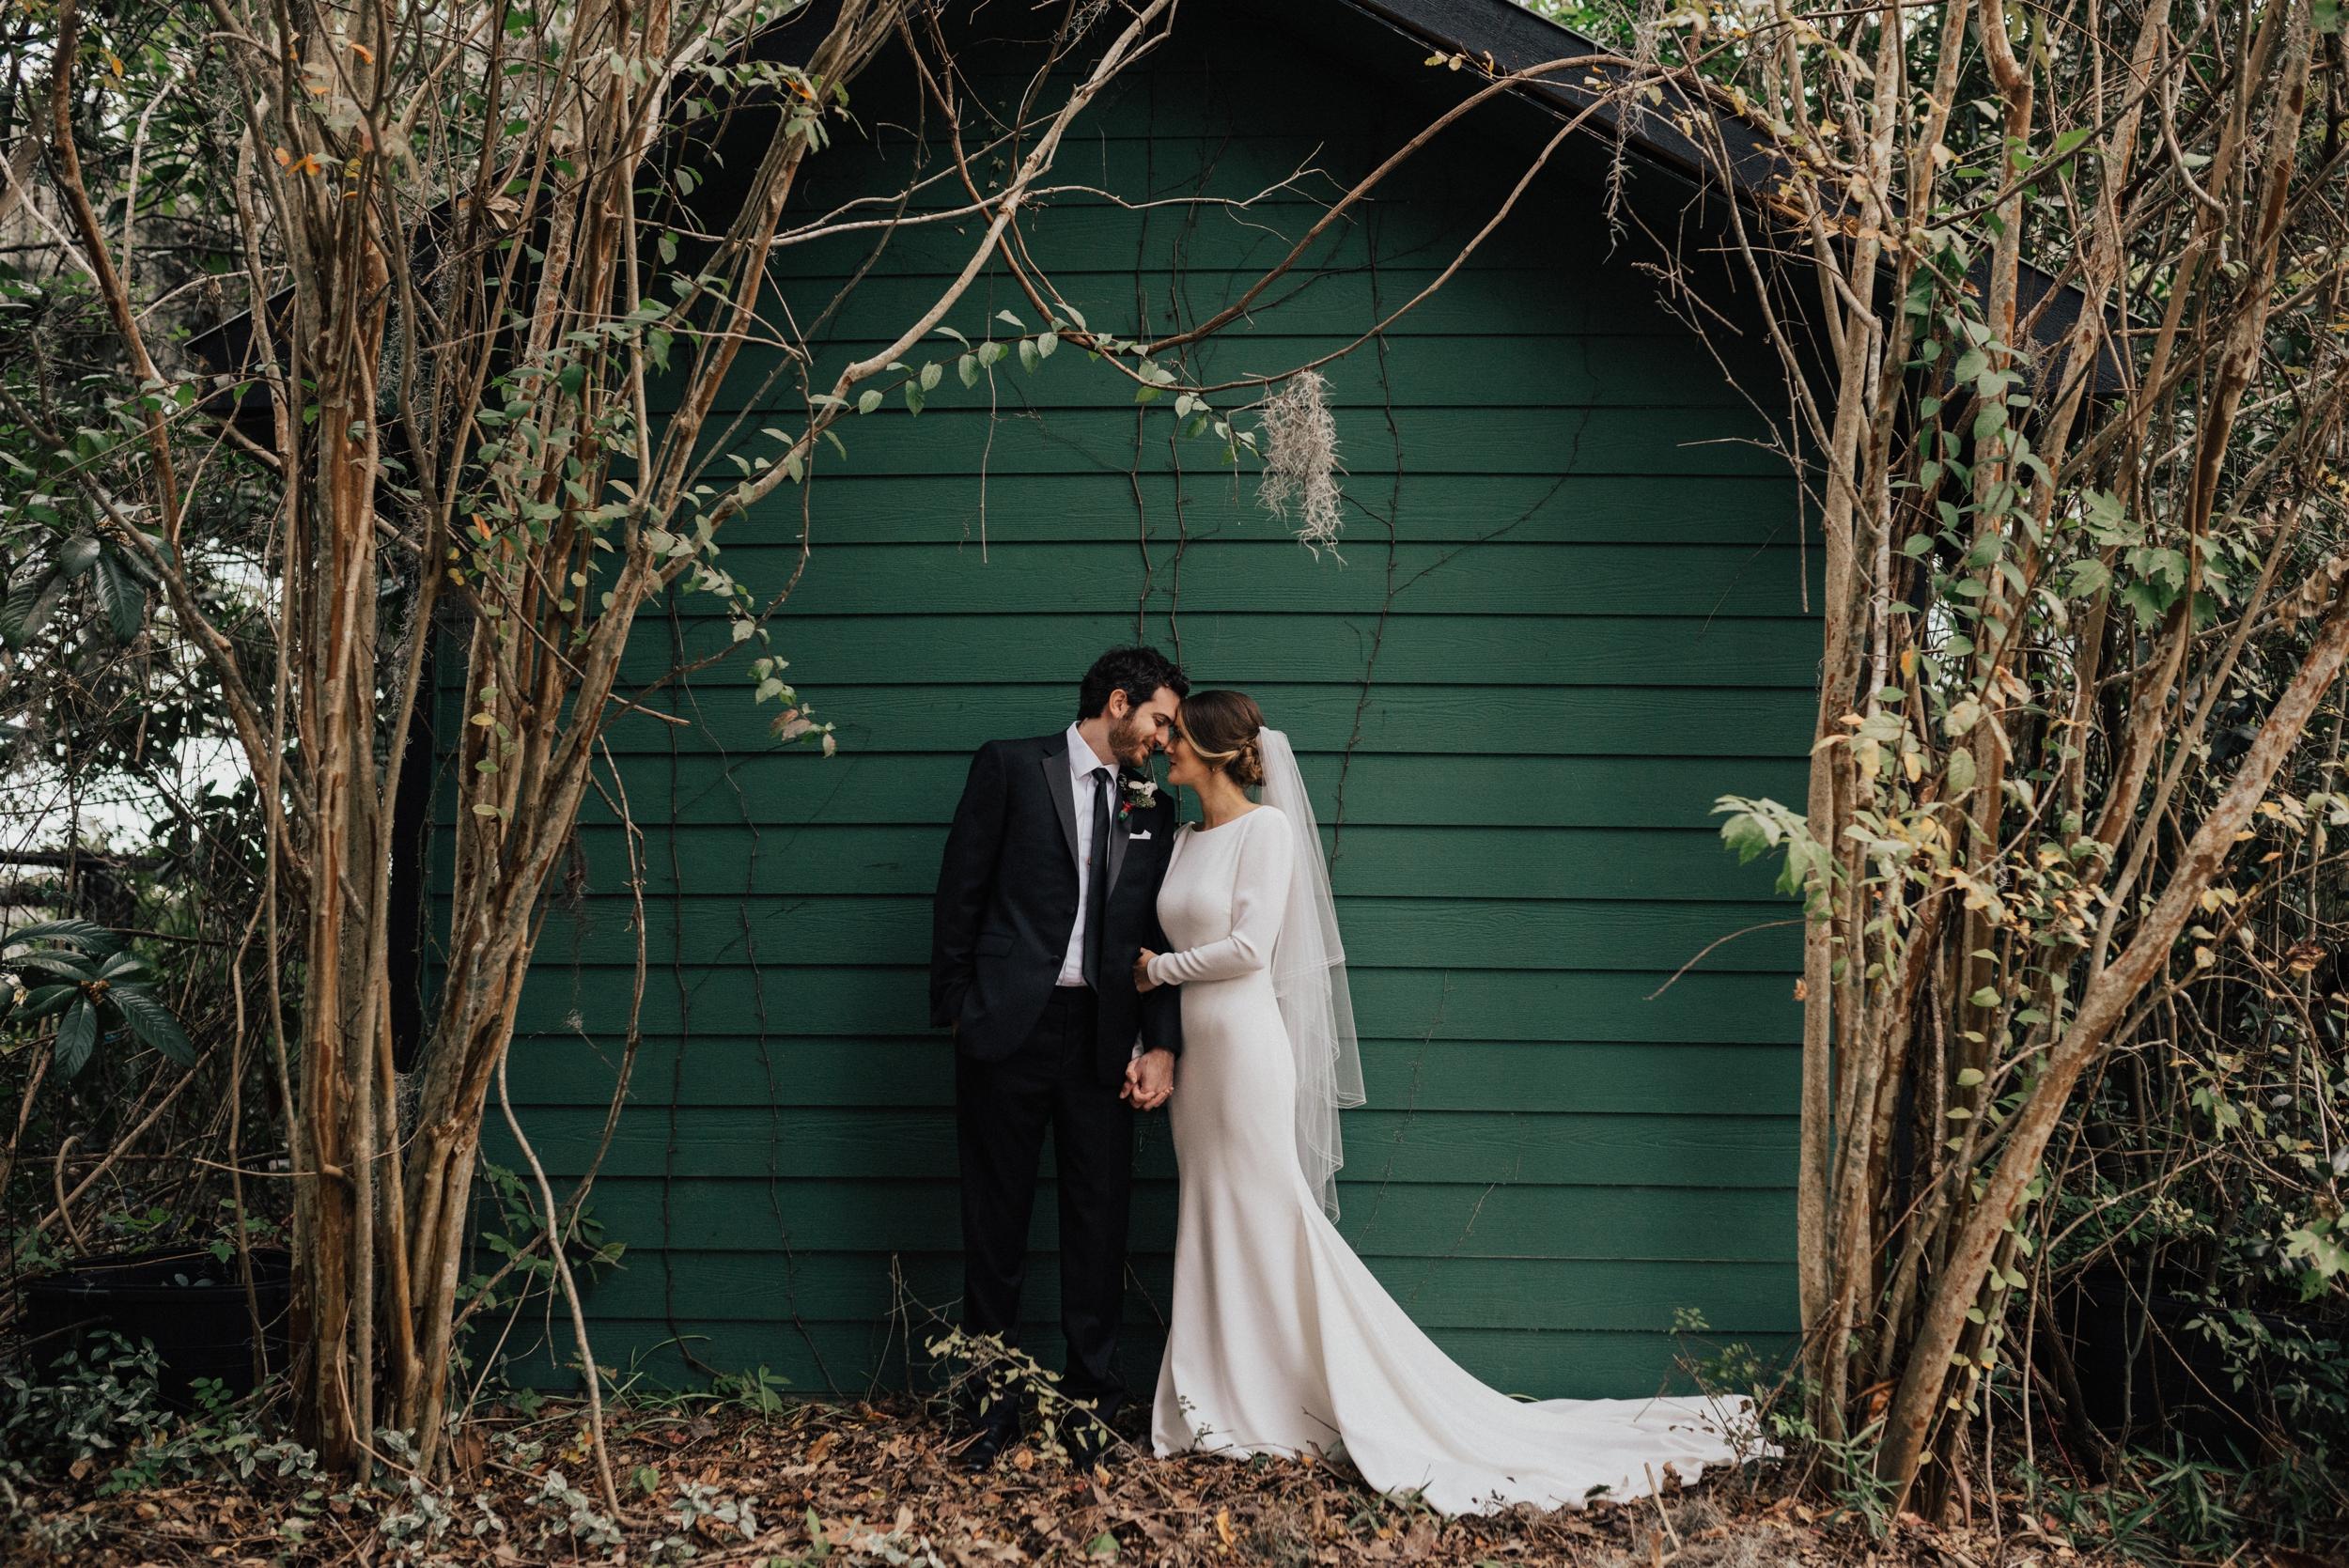 Charlestonweddingphotographer-14.jpg